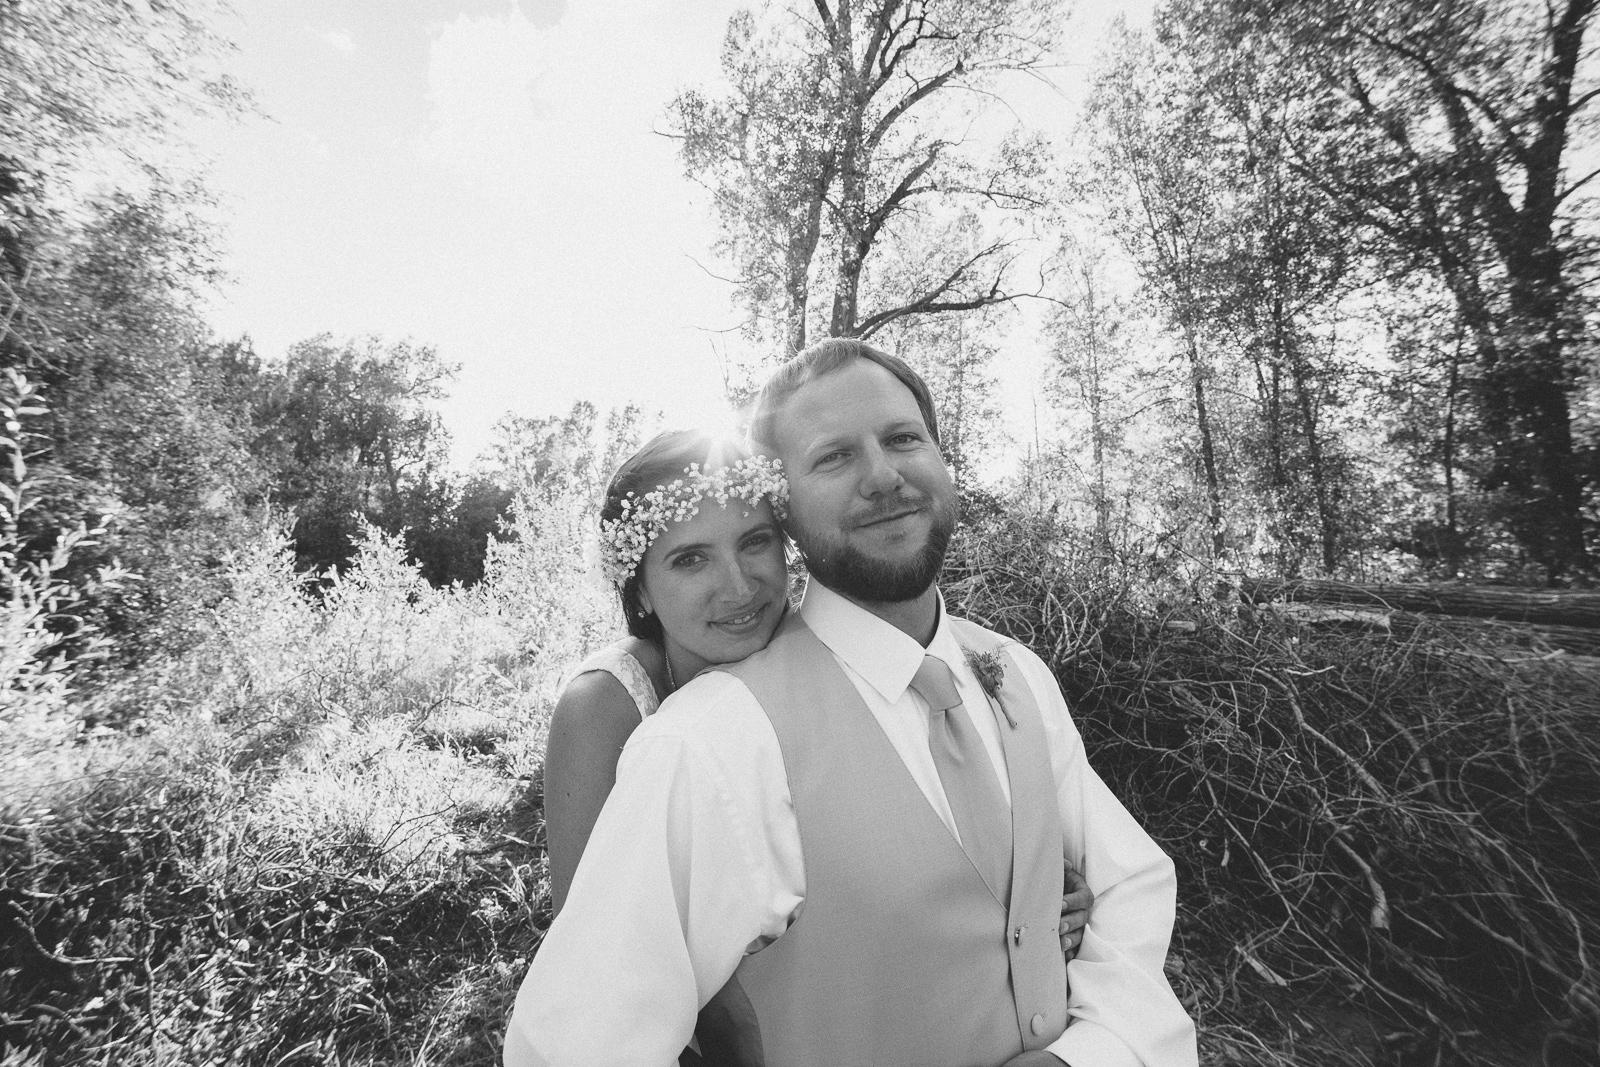 wedding fun photography bride groom unique nature trees